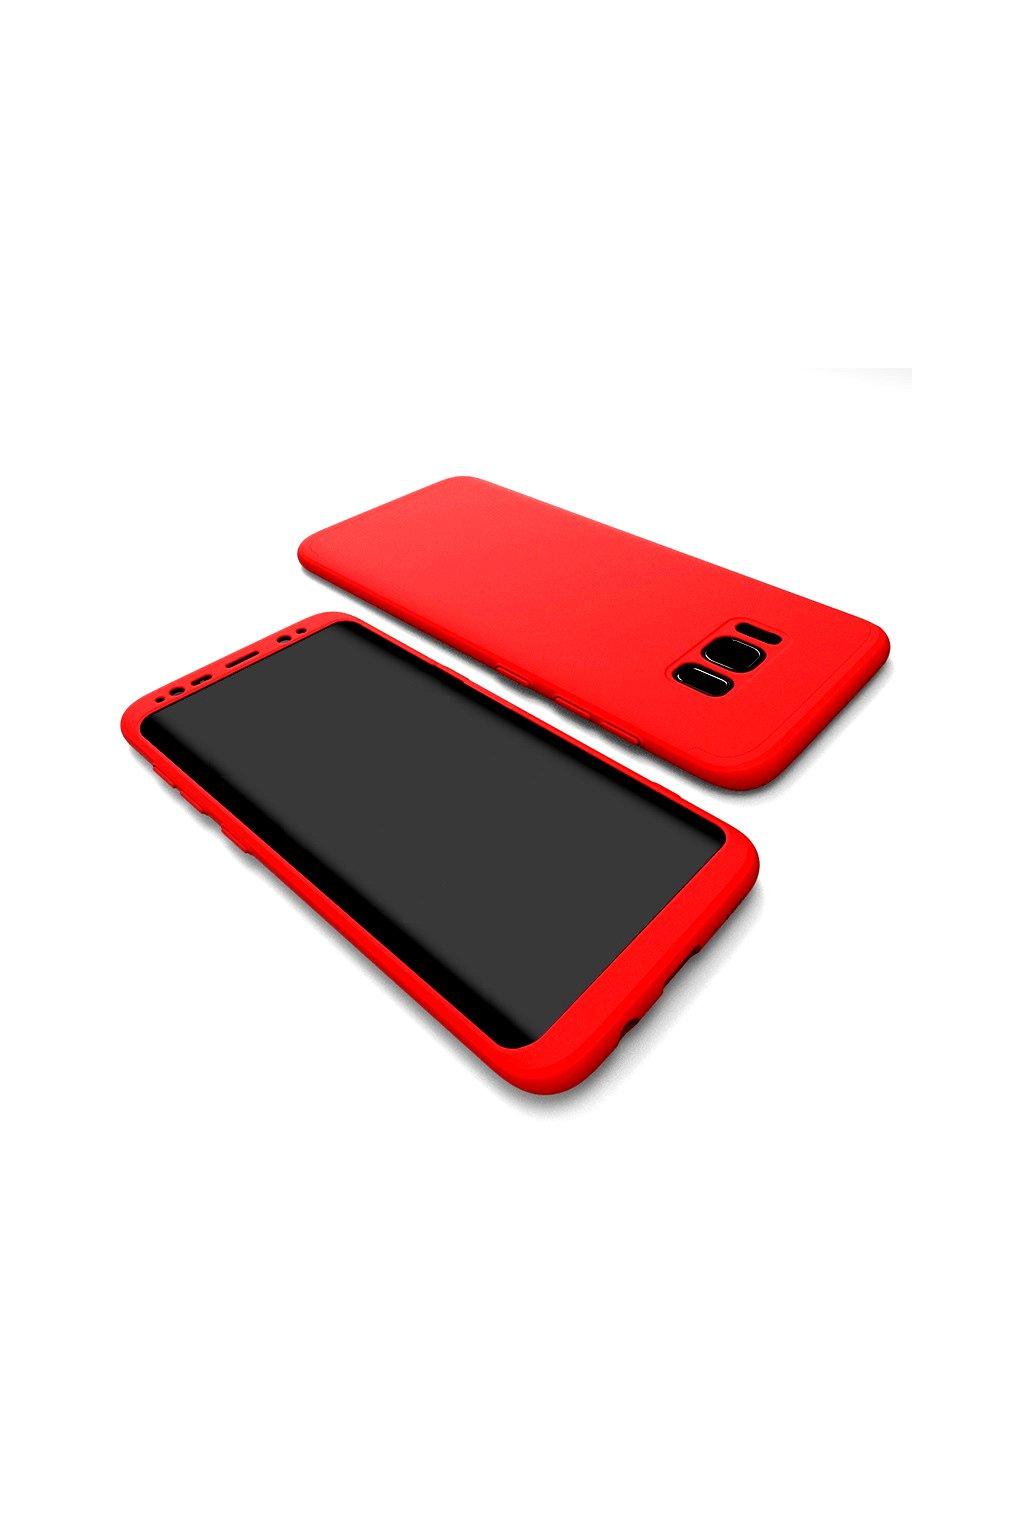 GKK Original Double Dip Case For Samsung Galaxy S8 S8 Plus Case Dual Armor 360 Full